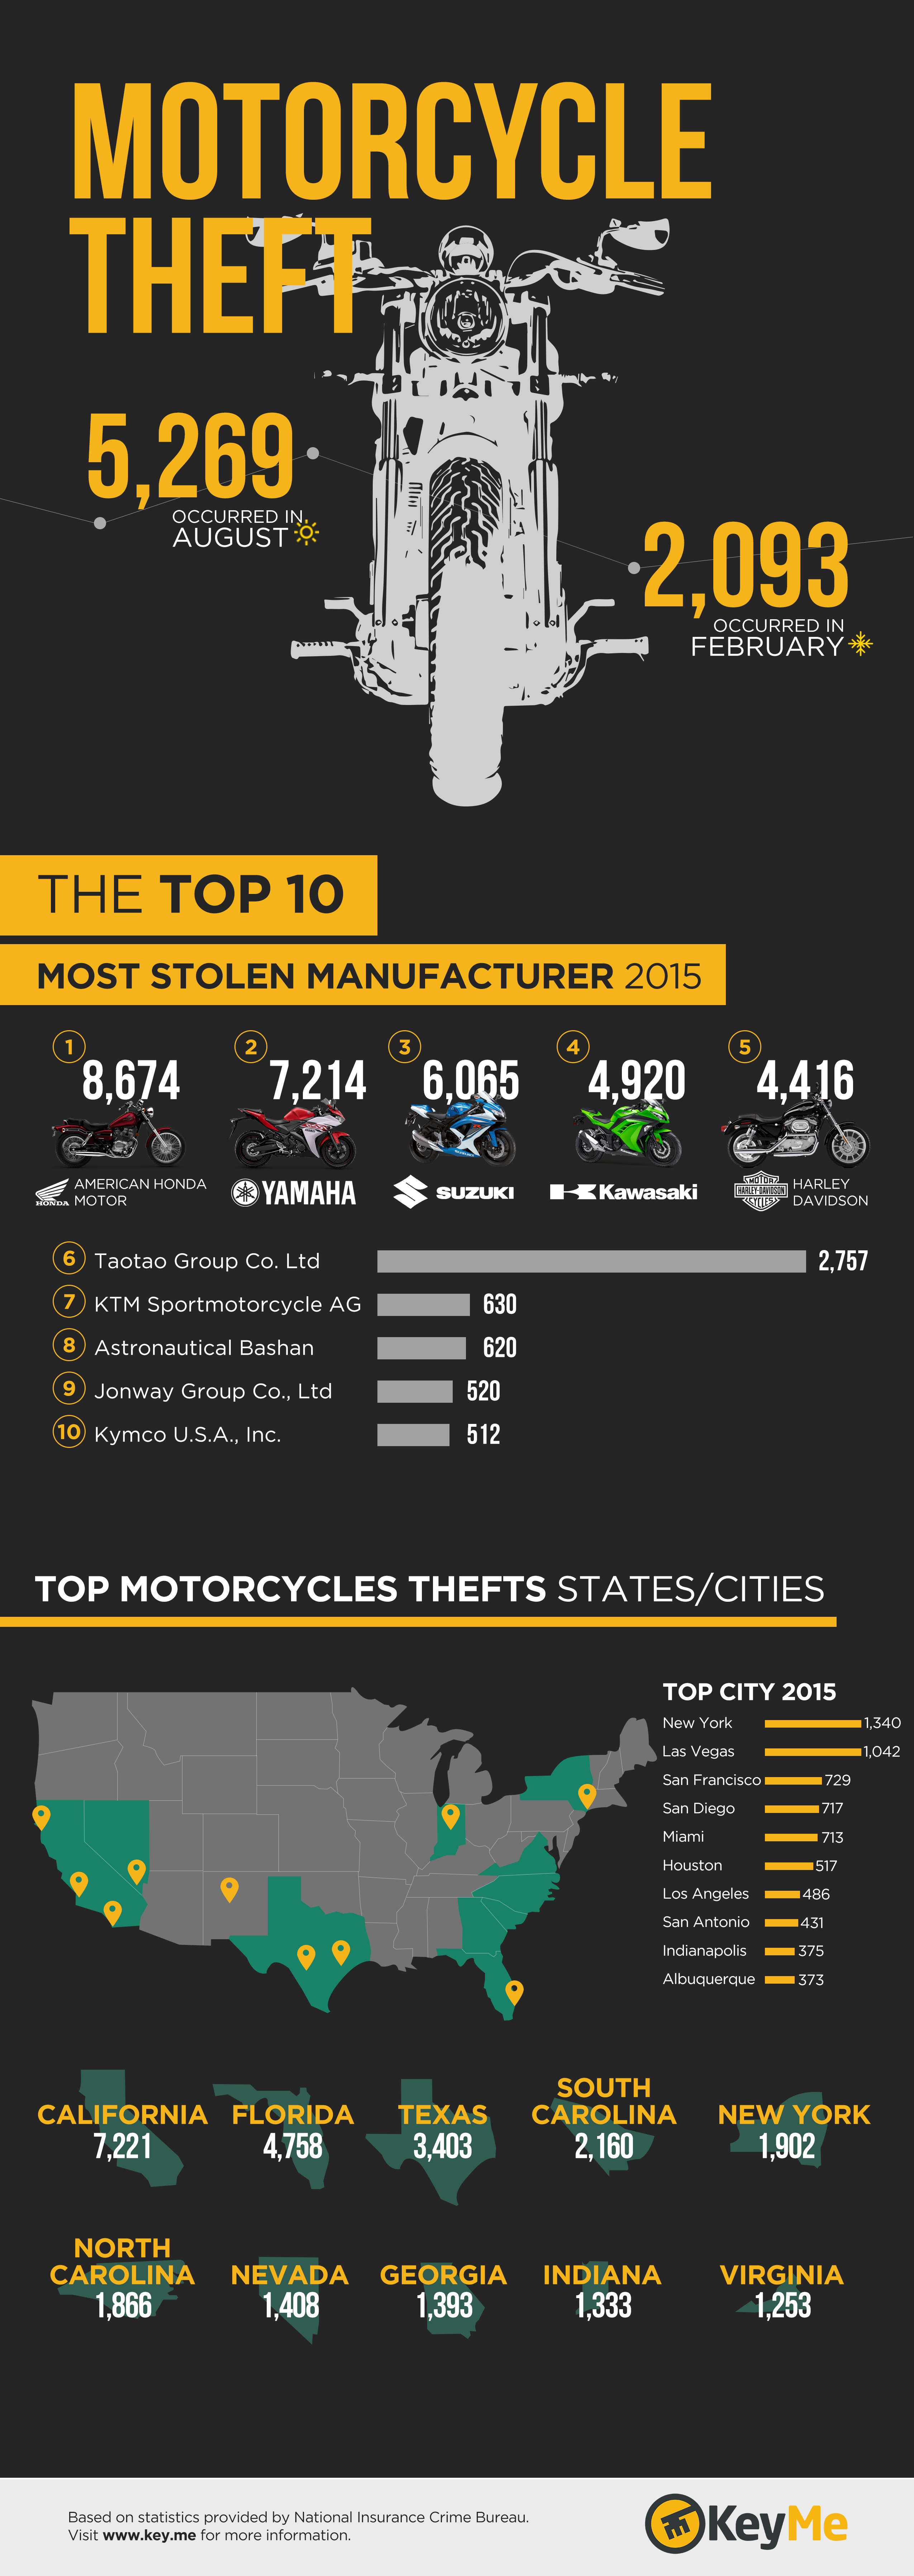 3 Ways To Prevent Lost Motorcycle Keys | KeyMe | KeyMe Blog